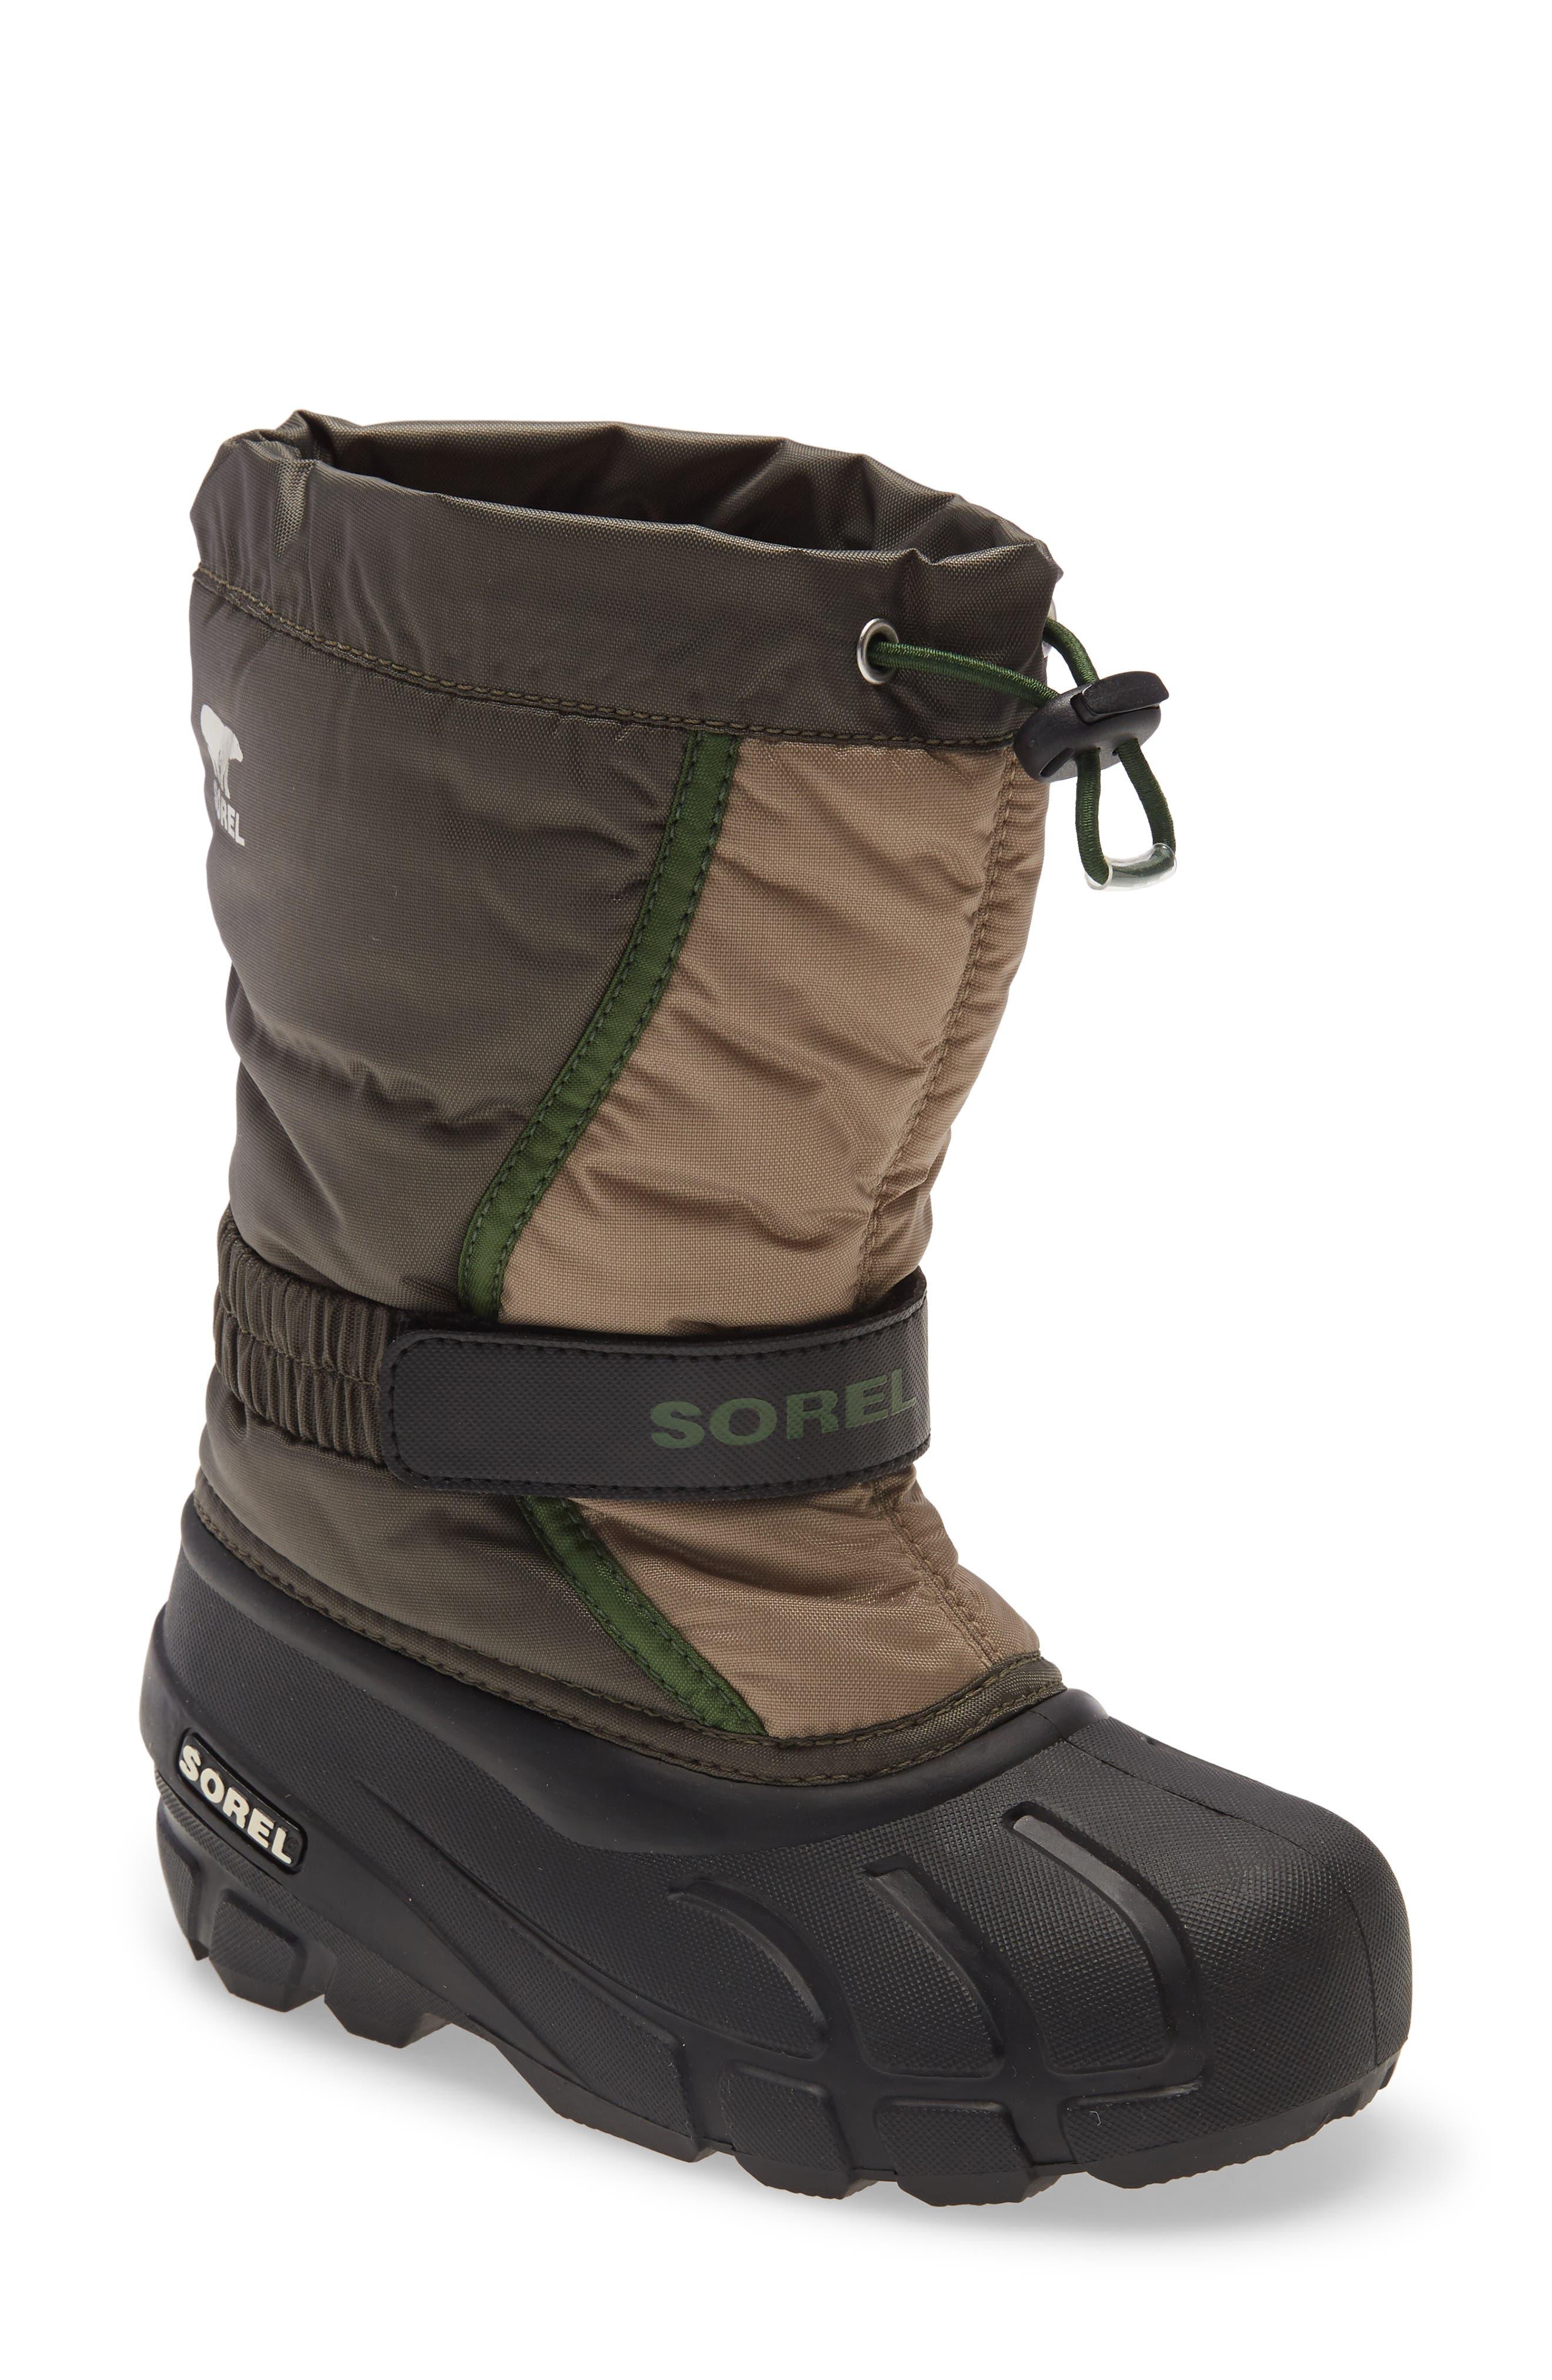 SOREL Flurry Weather Resistant Snow Boot (Walker, Toddler, Little Kid & Big Kid) | Nordstrom